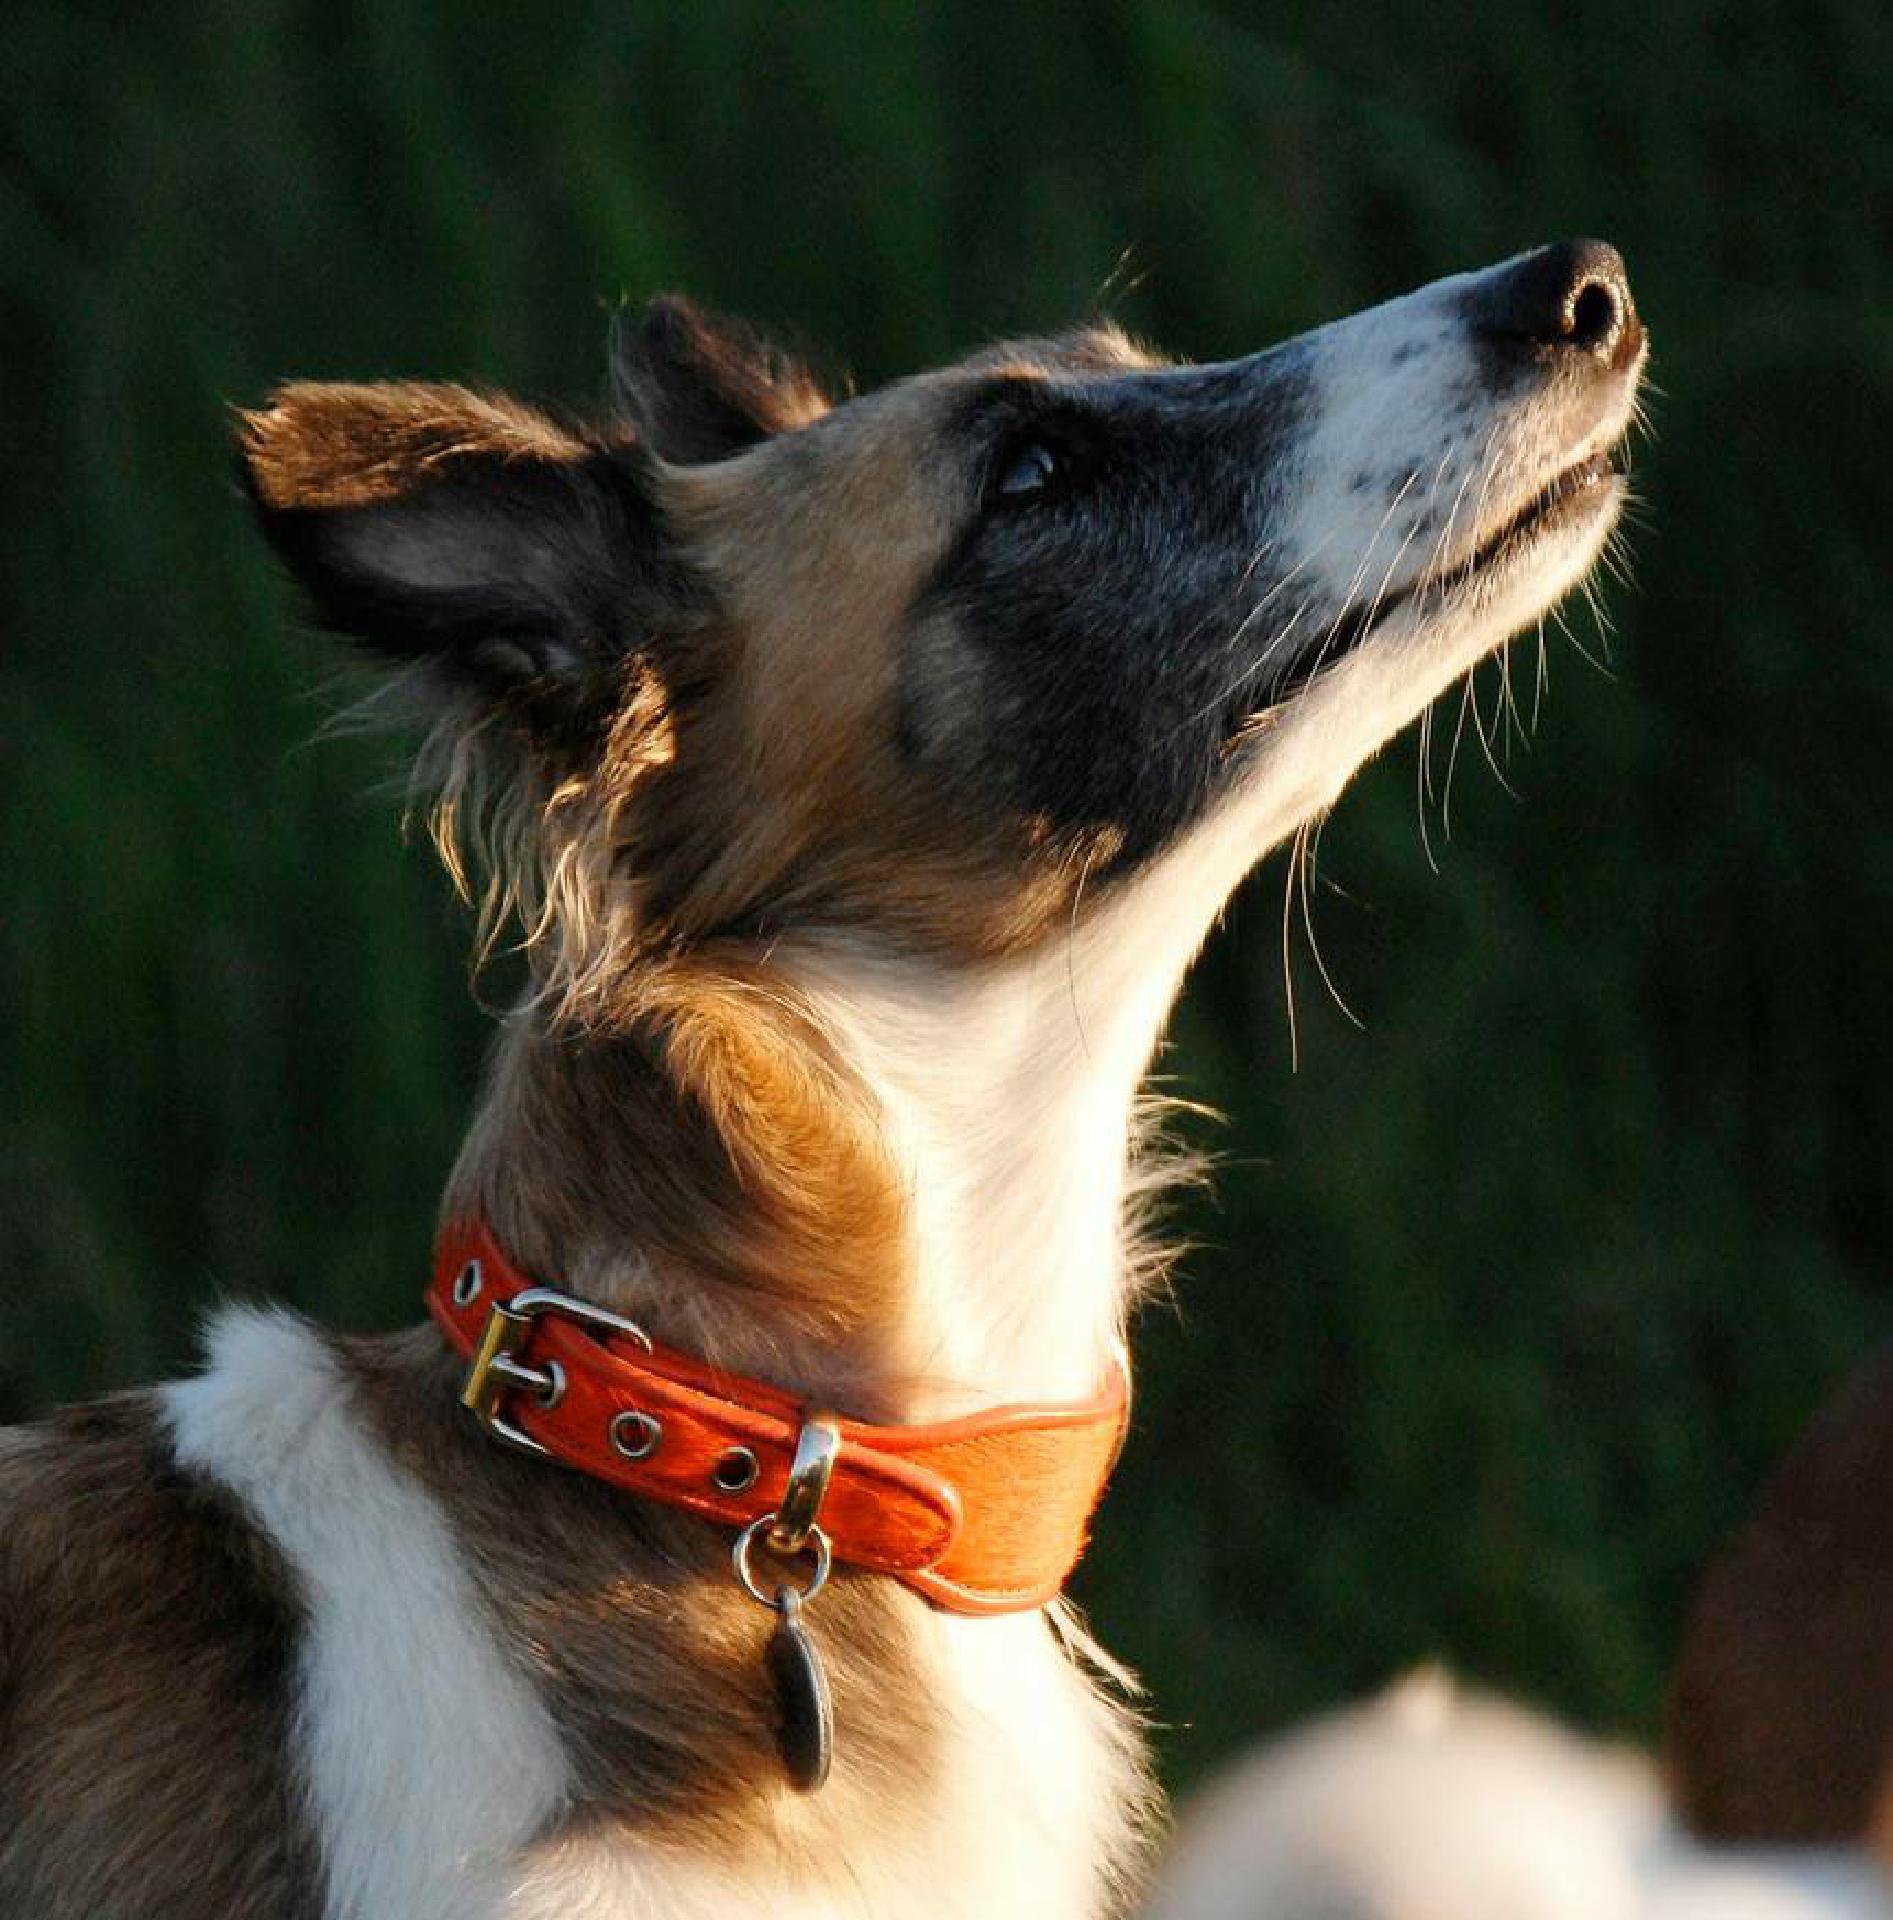 Wunderhund